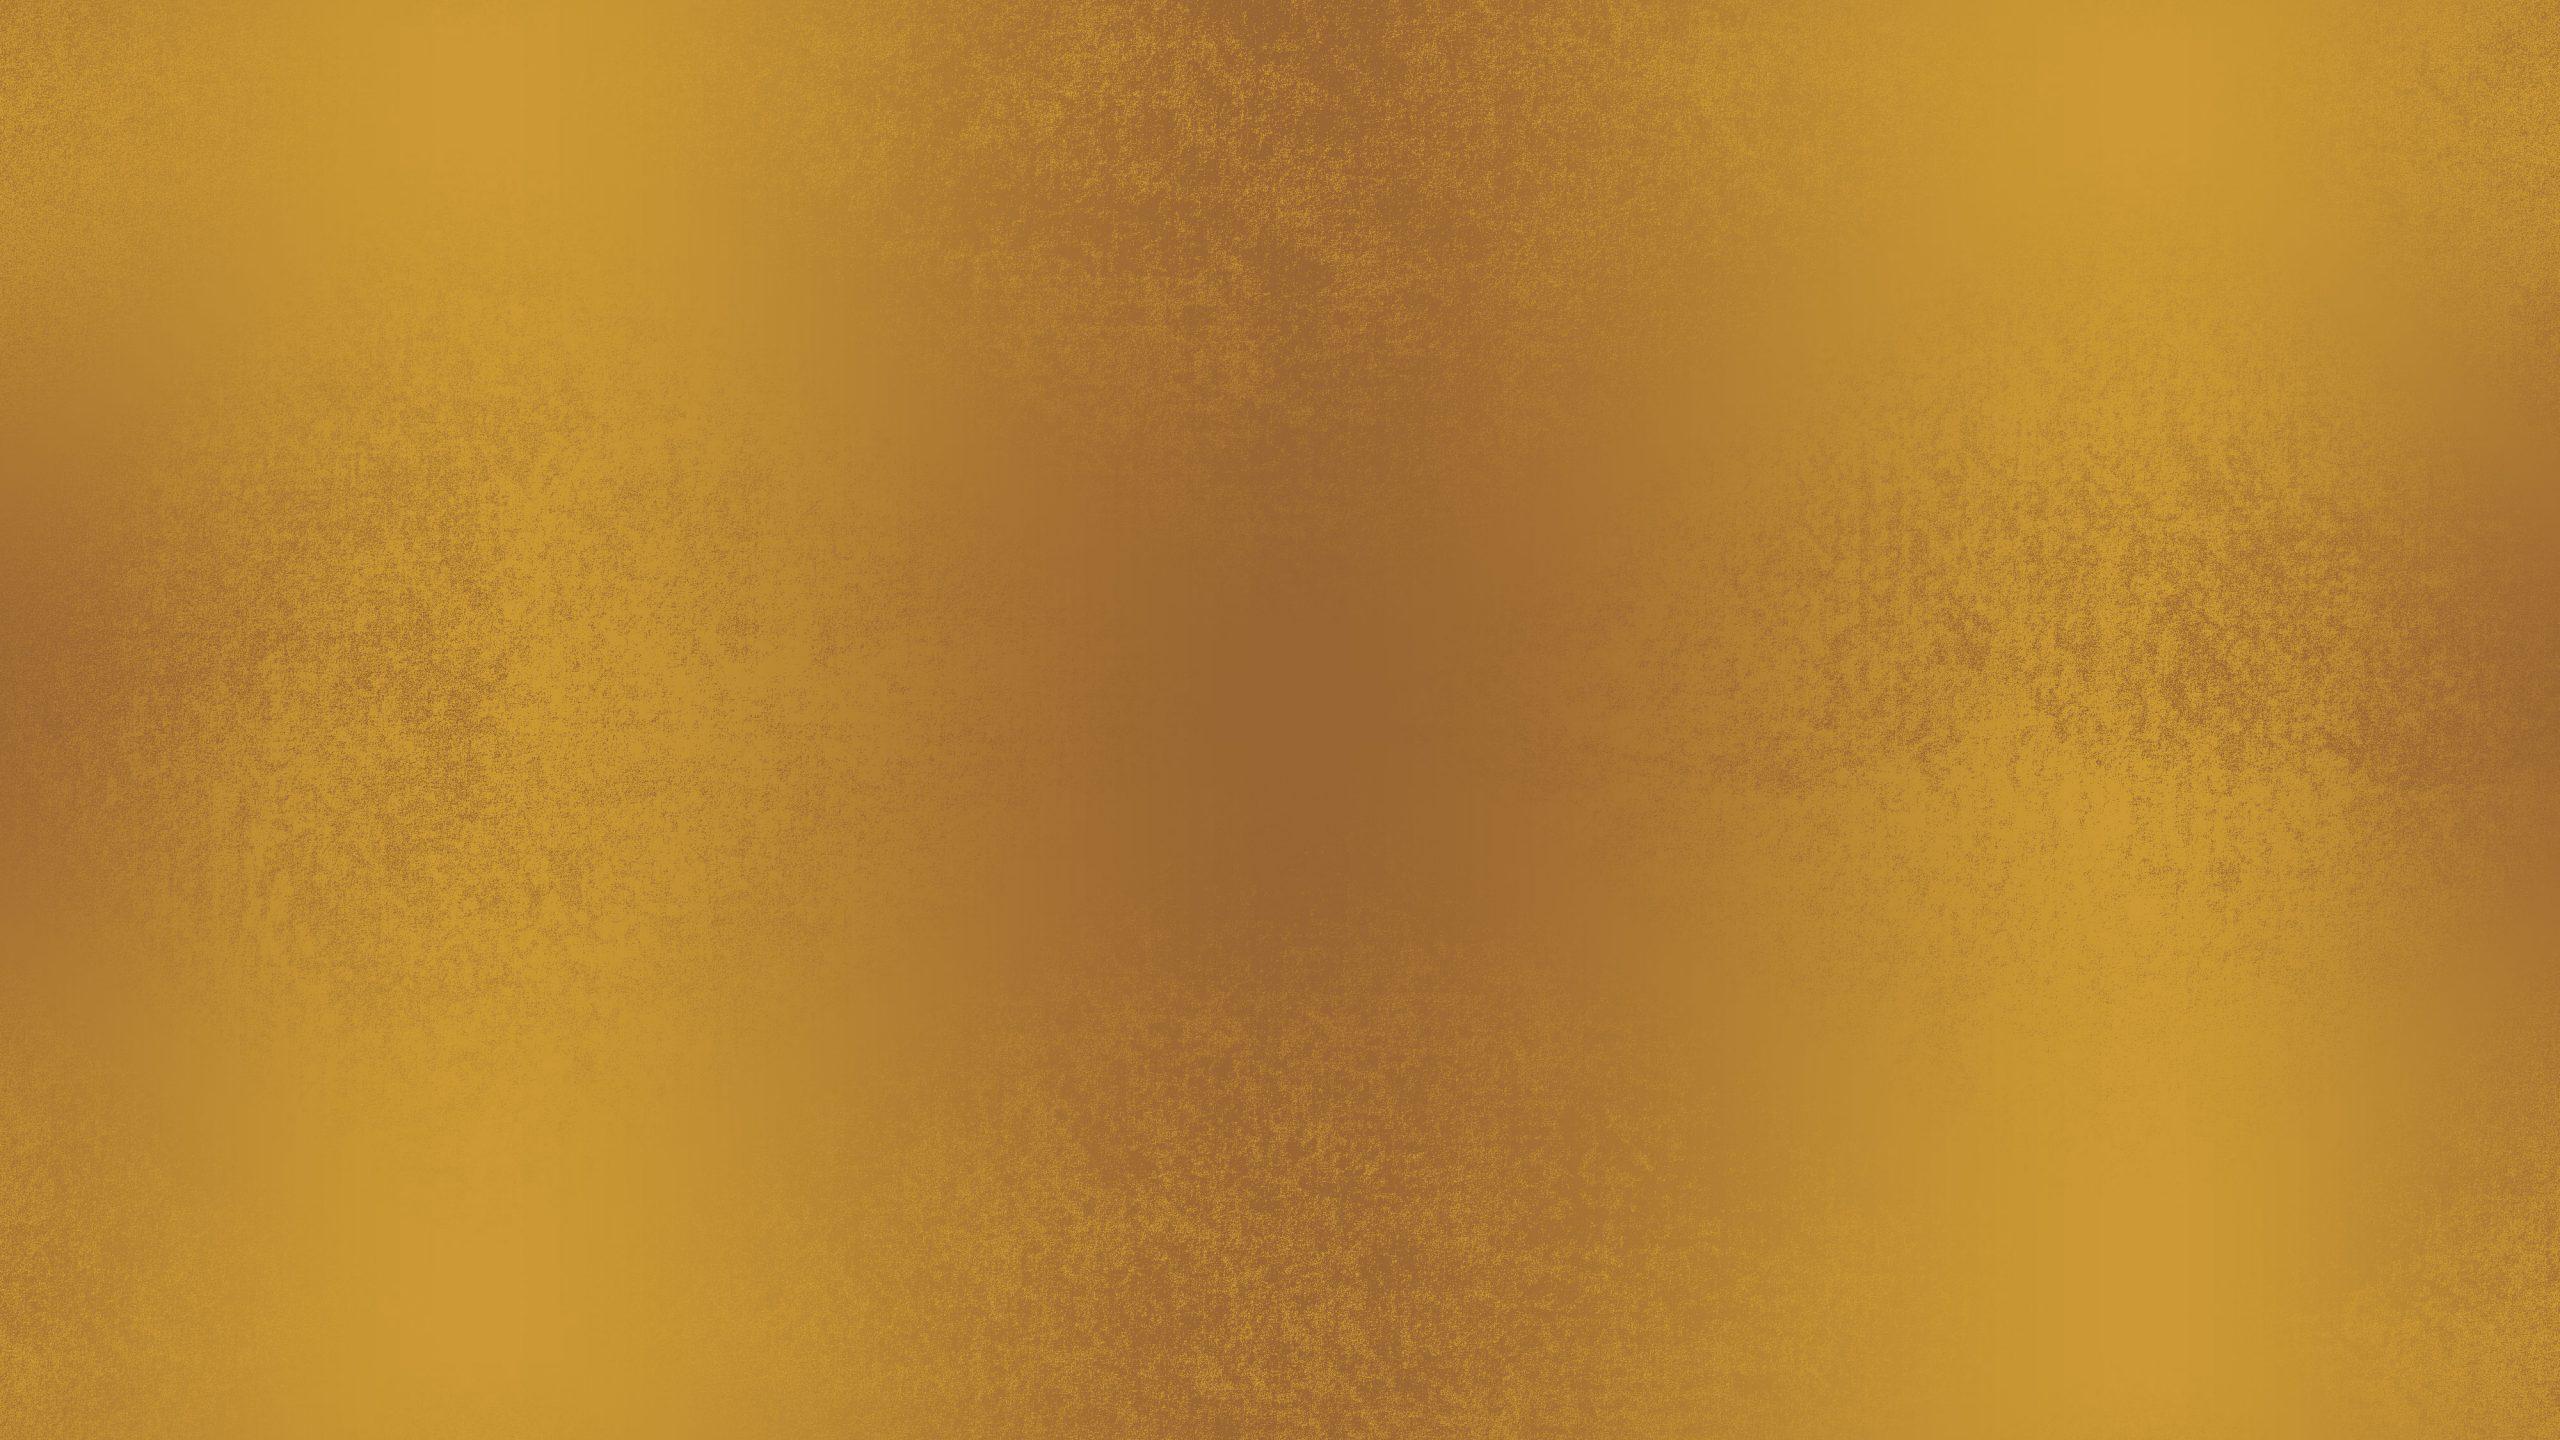 golden-texture-background